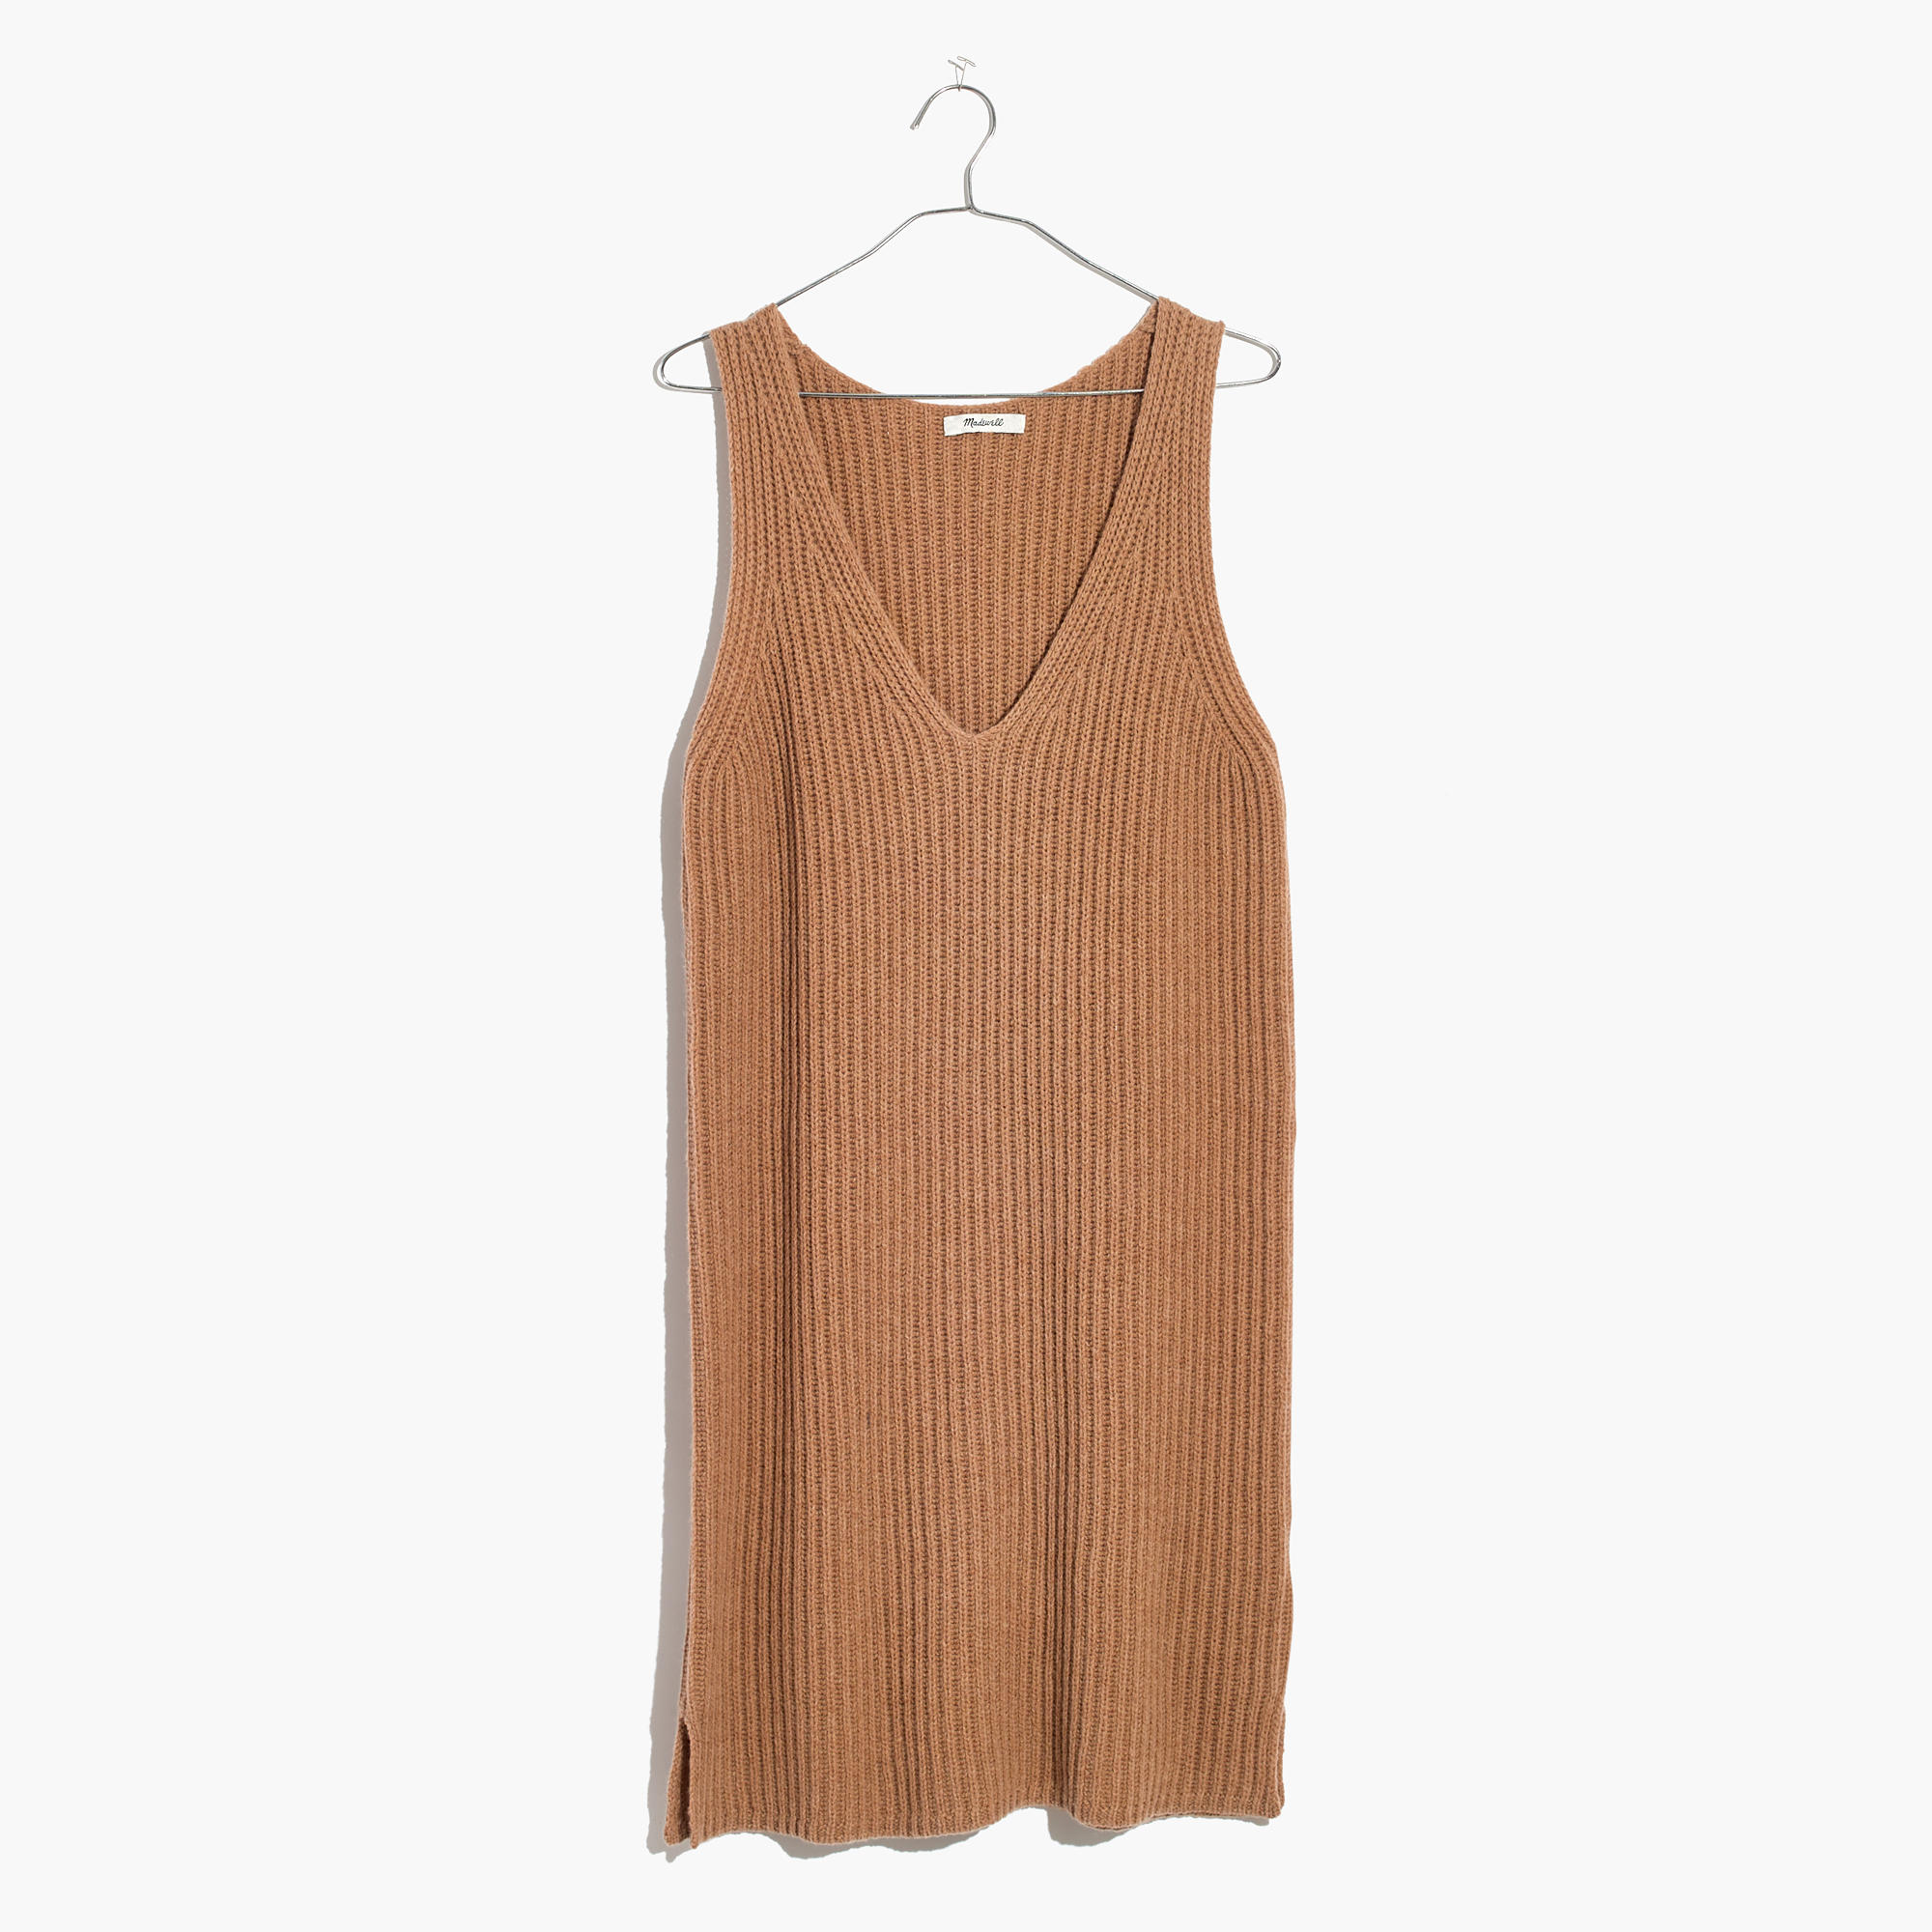 Tunic Sweater-Dress : shopmadewell casual dresses | Madewell